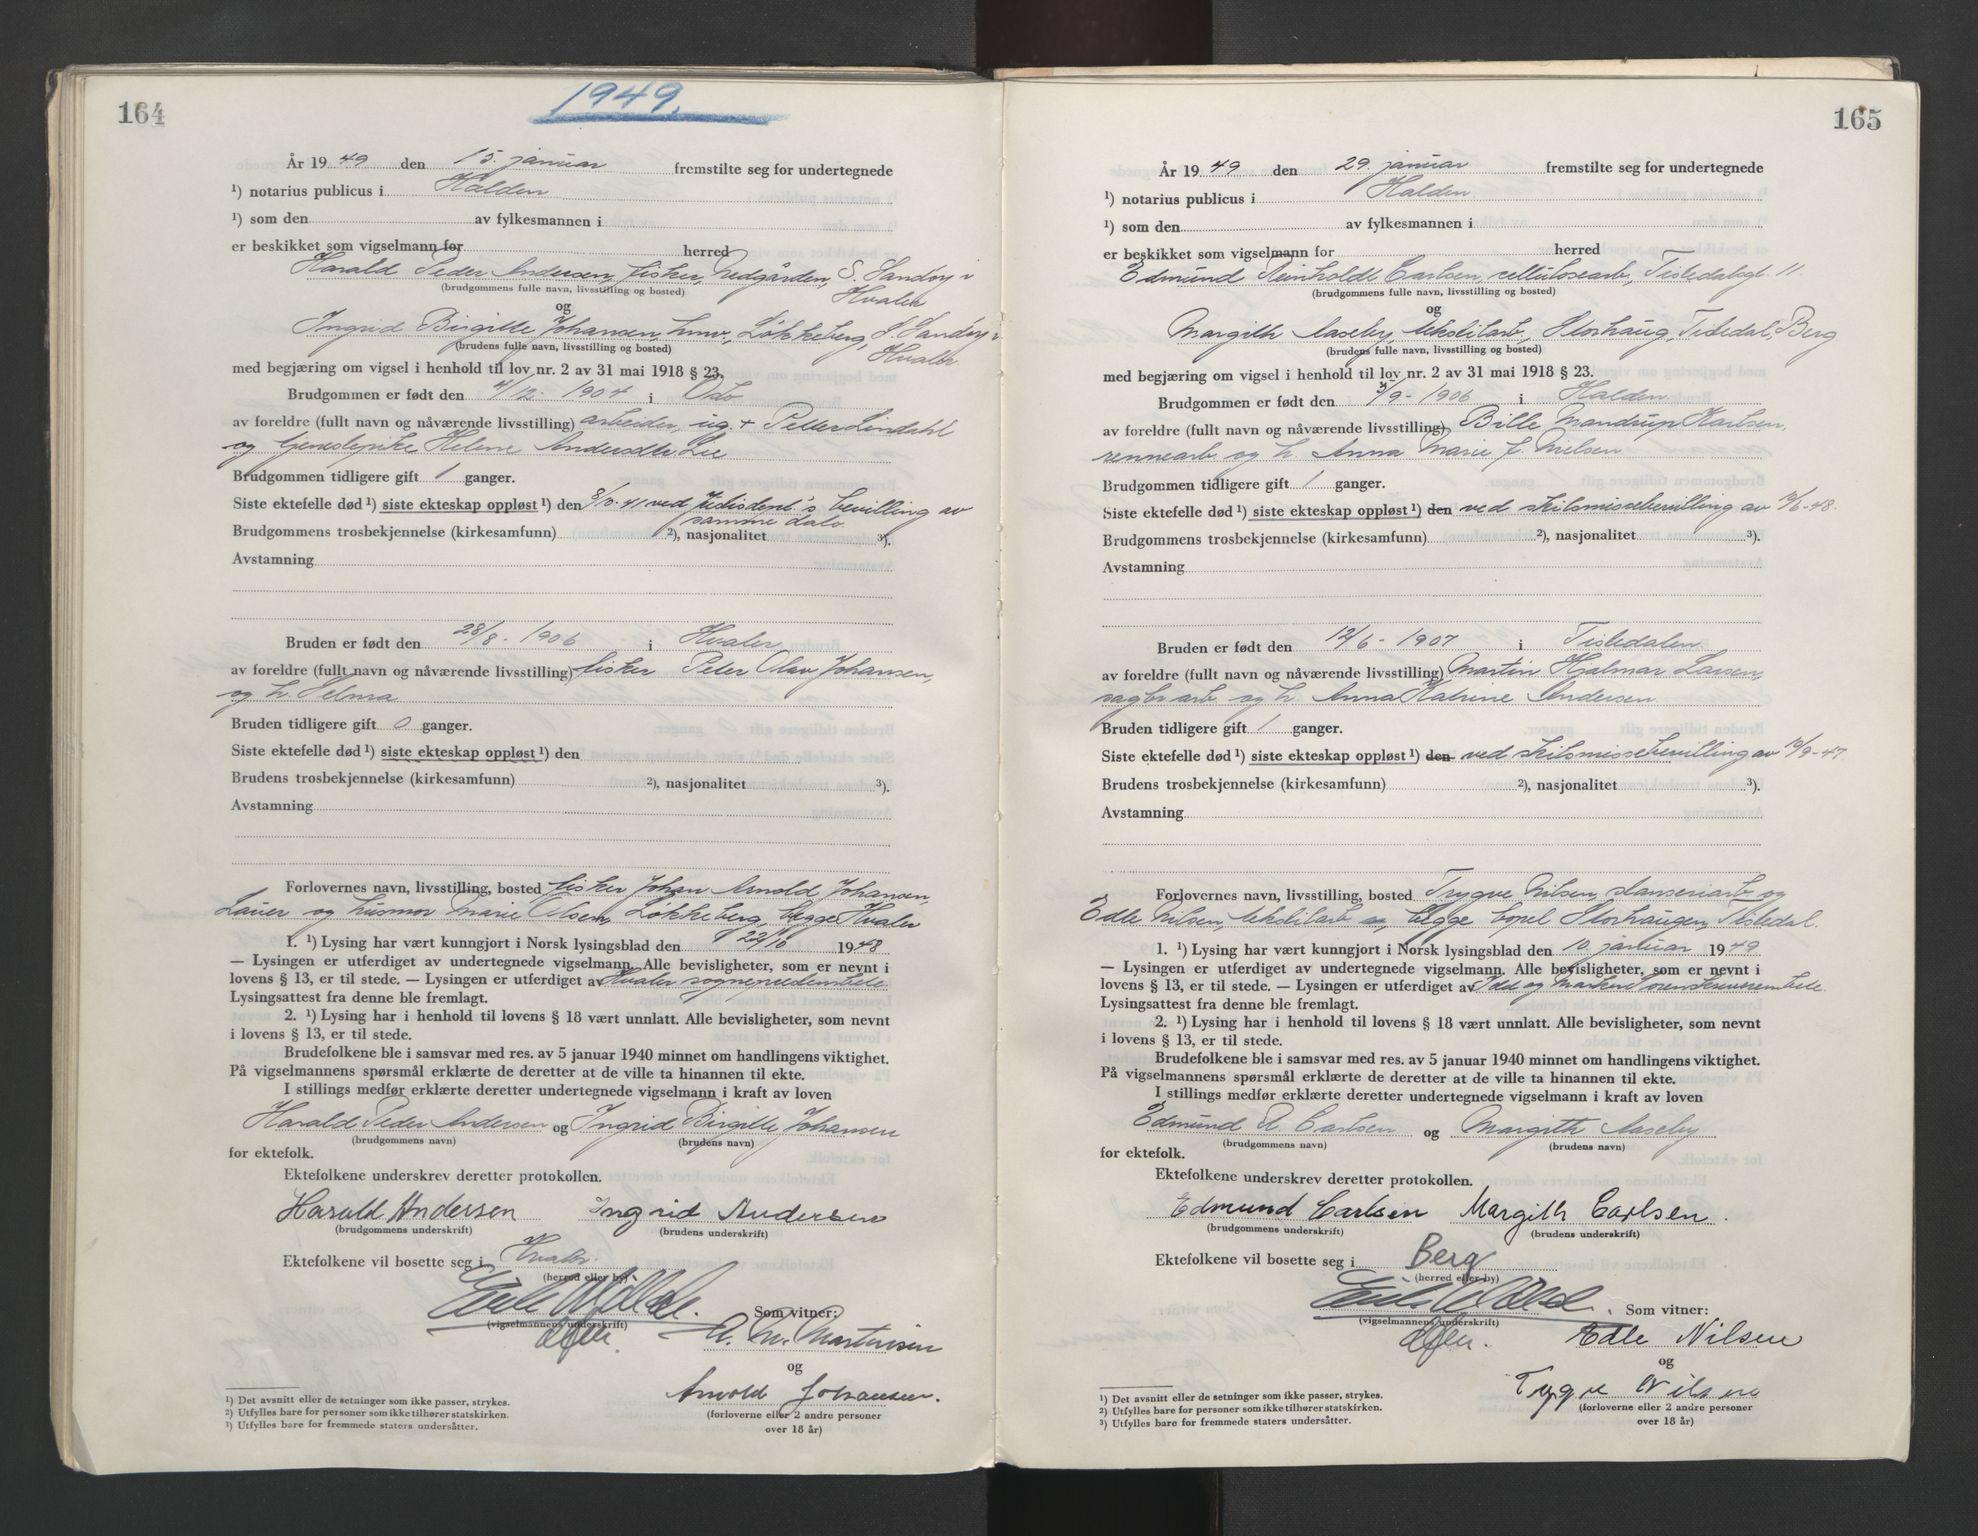 SAO, Idd og Marker sorenskriveri, L/Lc/L0001: Vigselsbøker, 1945-1949, s. 164-165